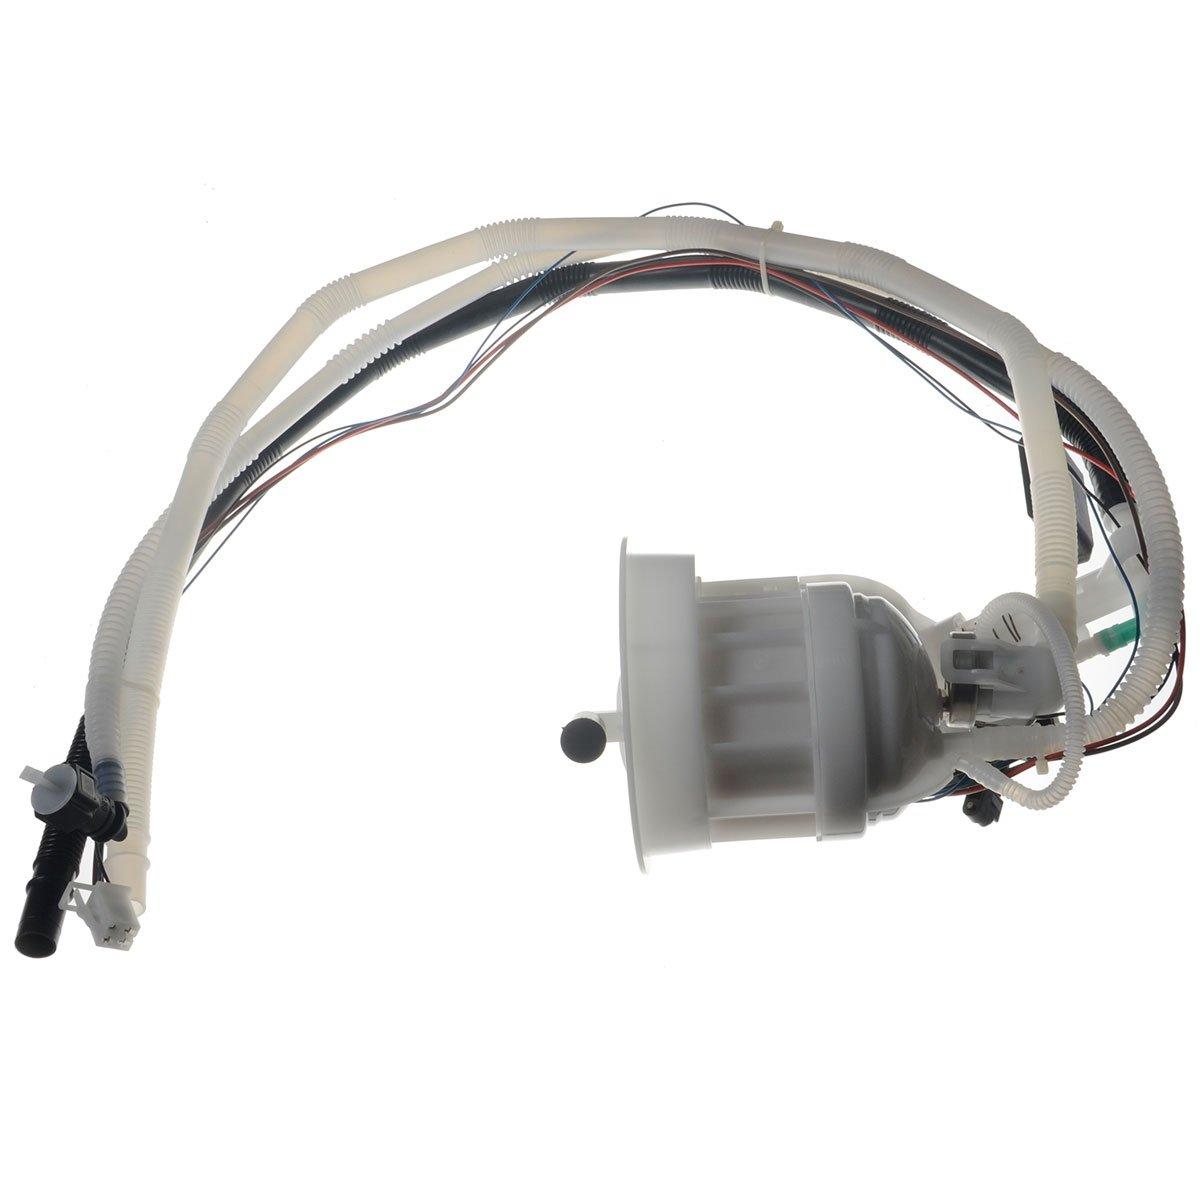 A Premium Fuel Pump Sending Unit With Filter For 2007 Toyota Corolla Location Mercedes Benz W219 W211 S211 E280 E320 E350 E500 Cls500 Automotive